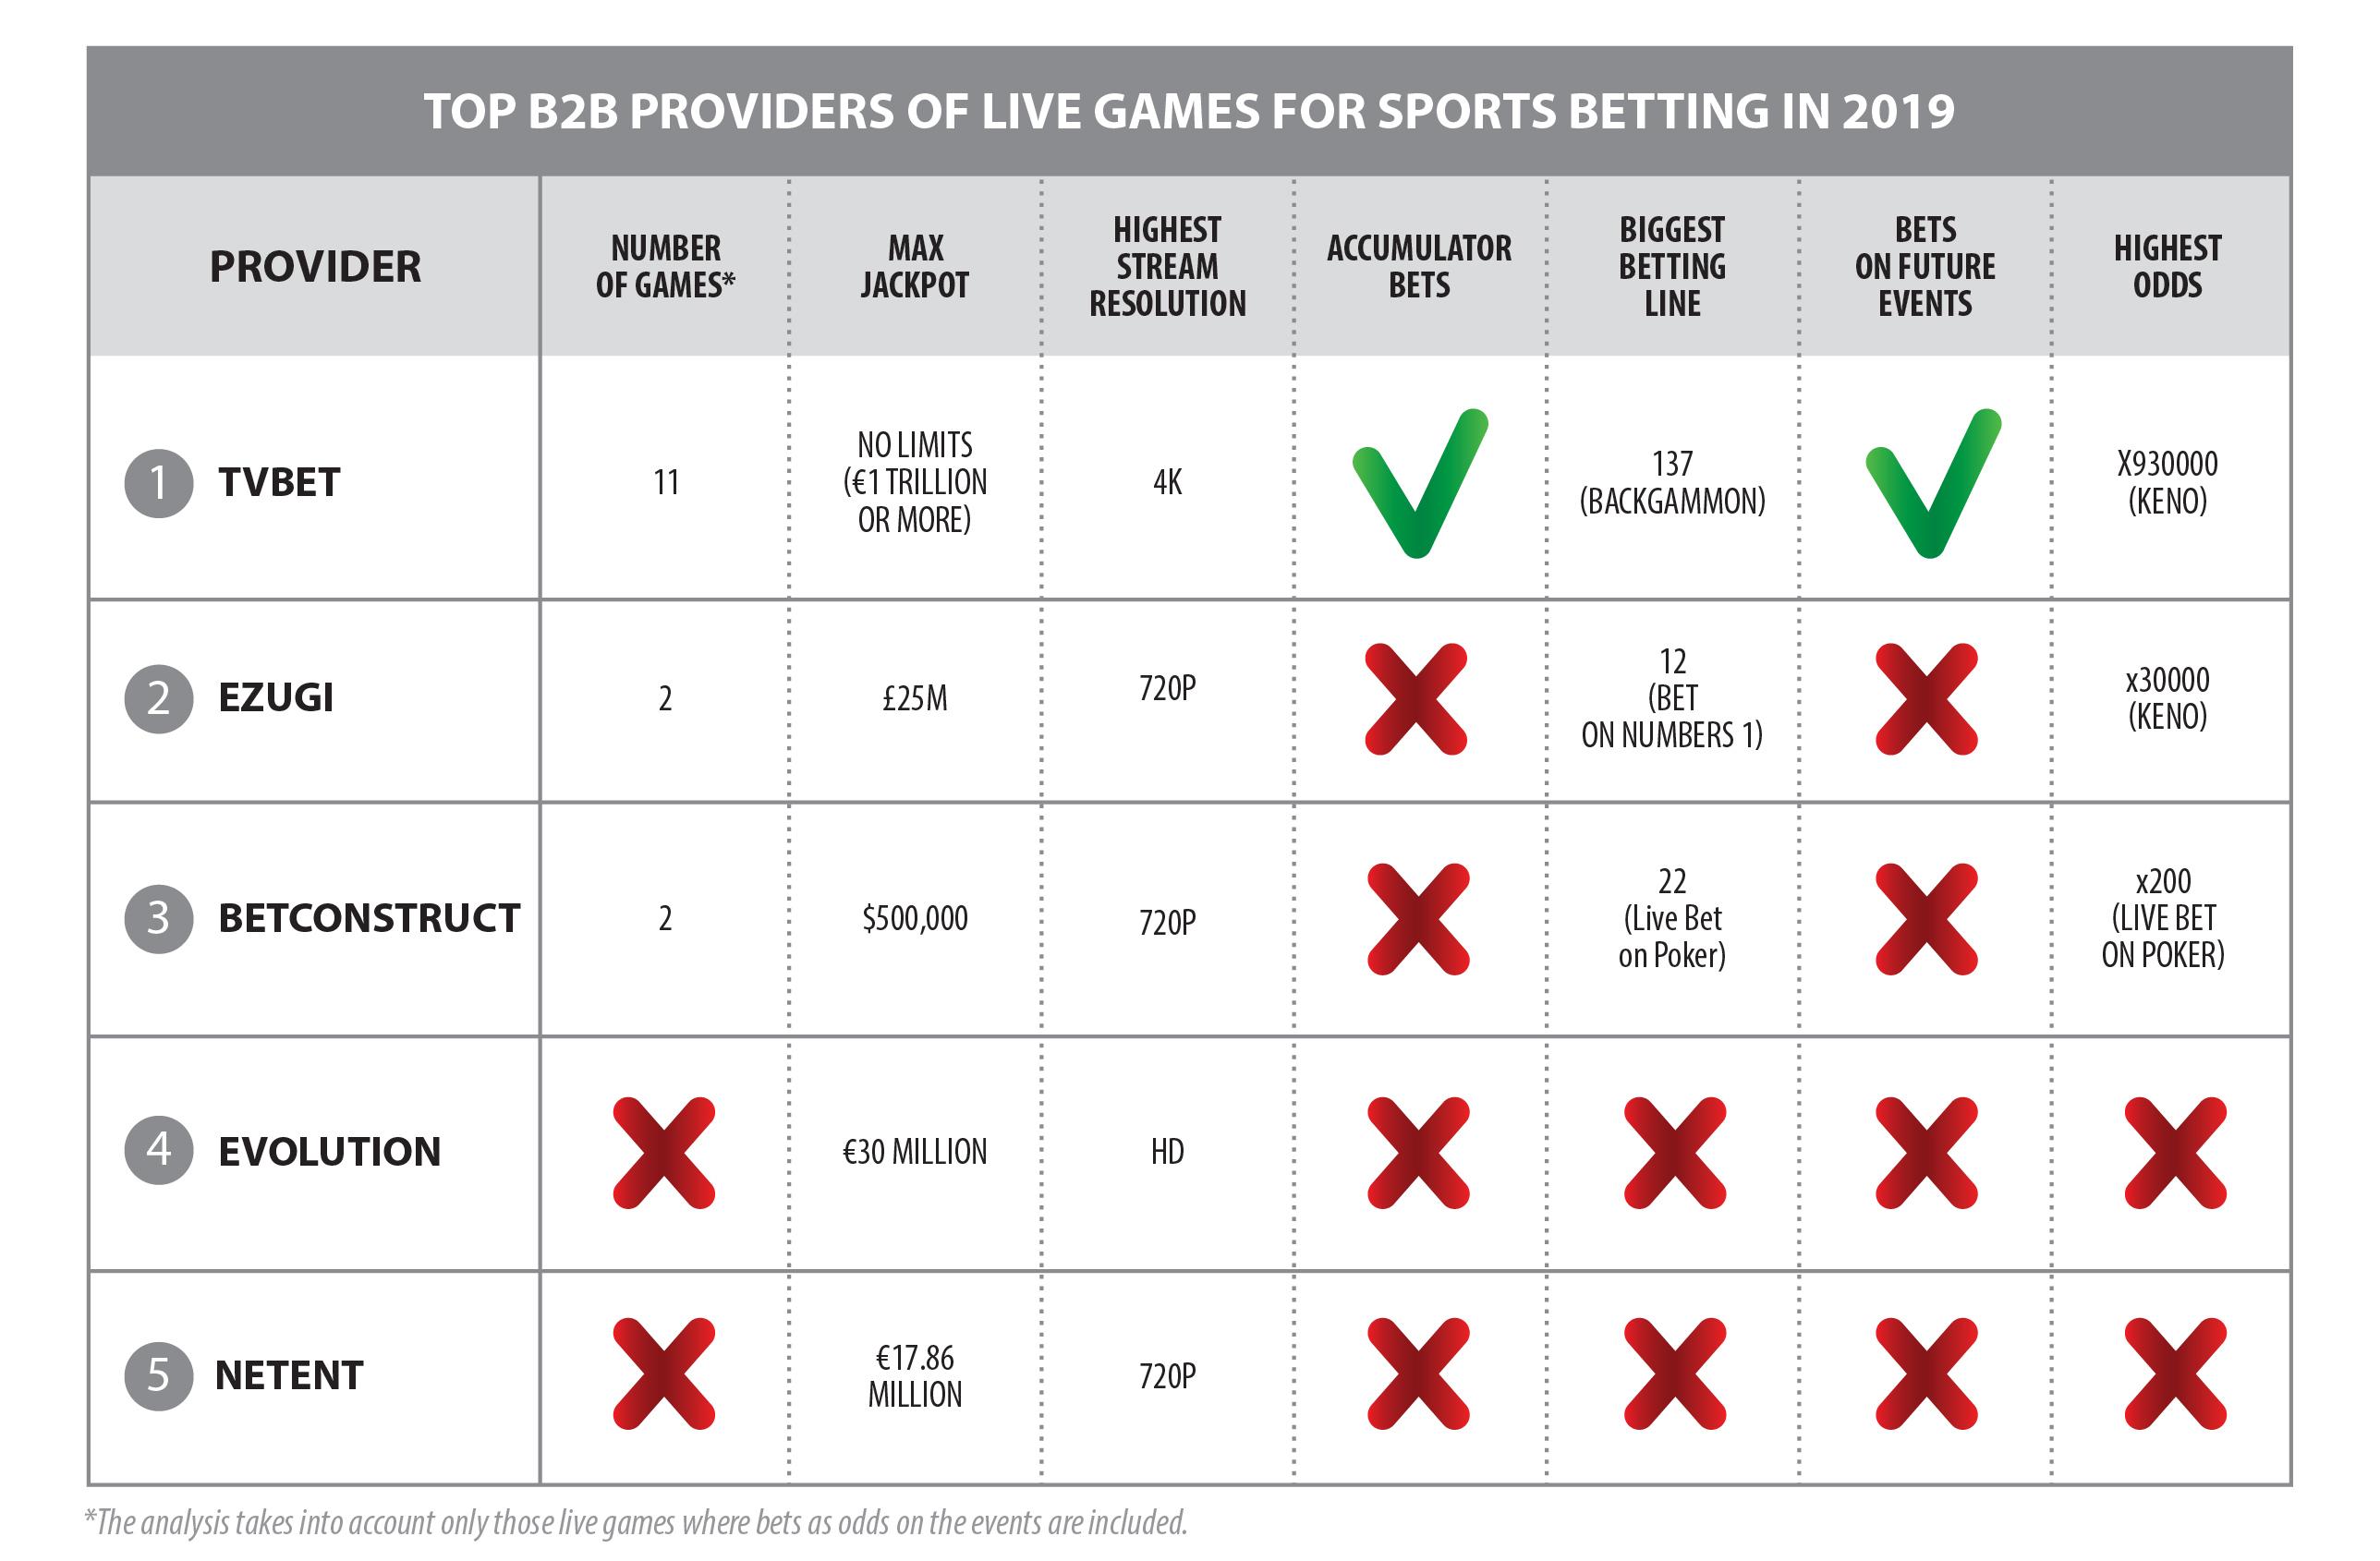 Sport betting sites ranking silva sonnen 2 betting odds